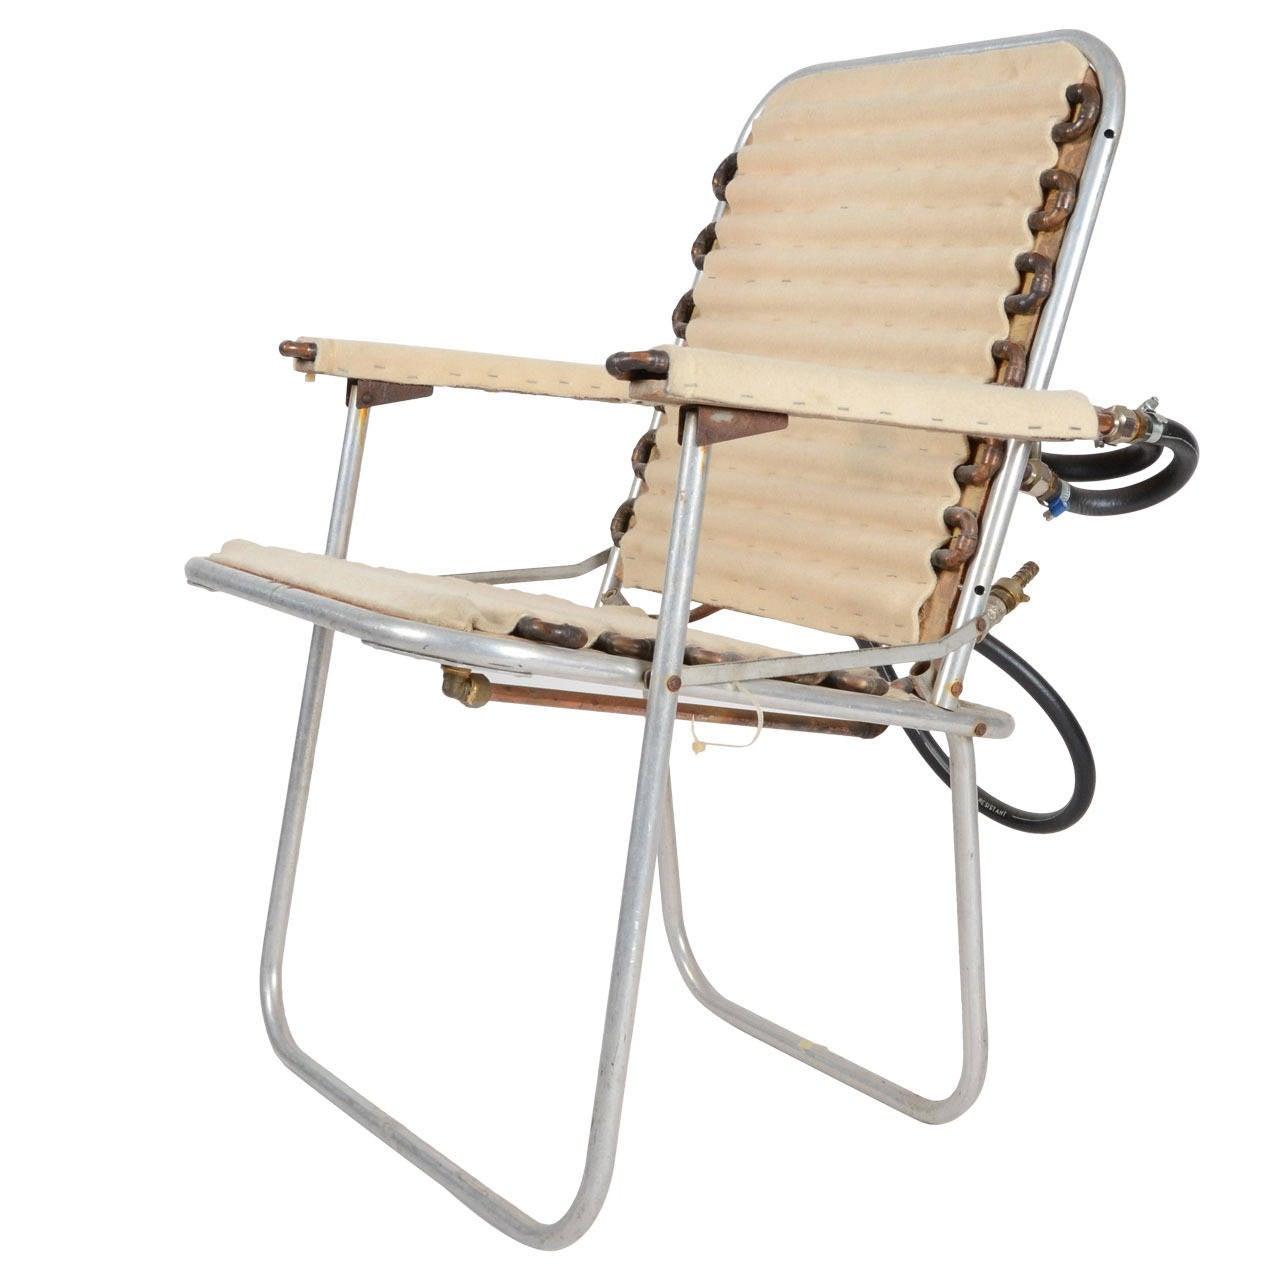 "Ulf Rollof, Sculpture ""Heated Chair"", 1993"